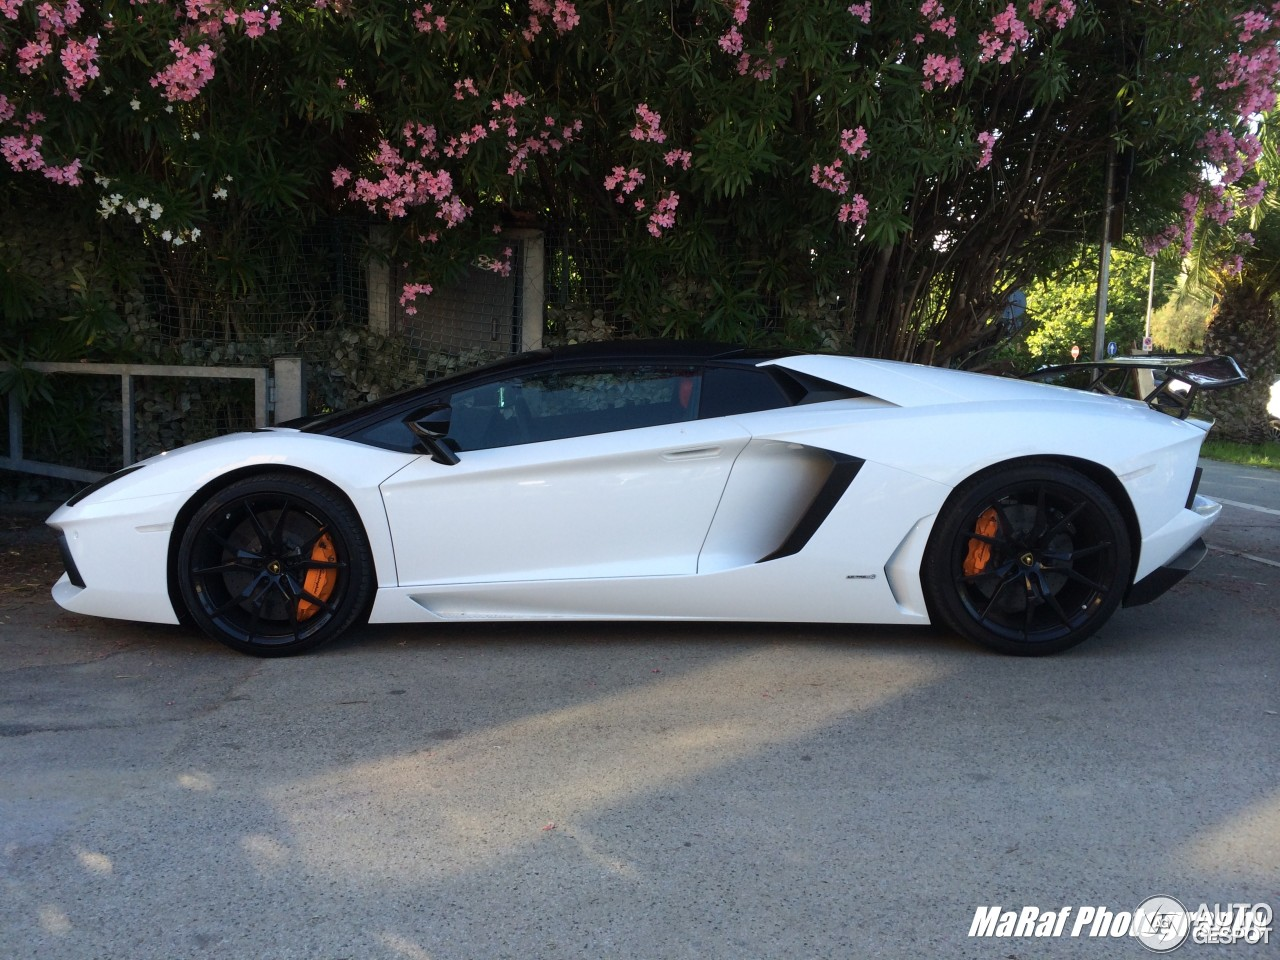 6 i lamborghini aventador lp700 4 roadster 6 - Lamborghini Aventador Roadster White